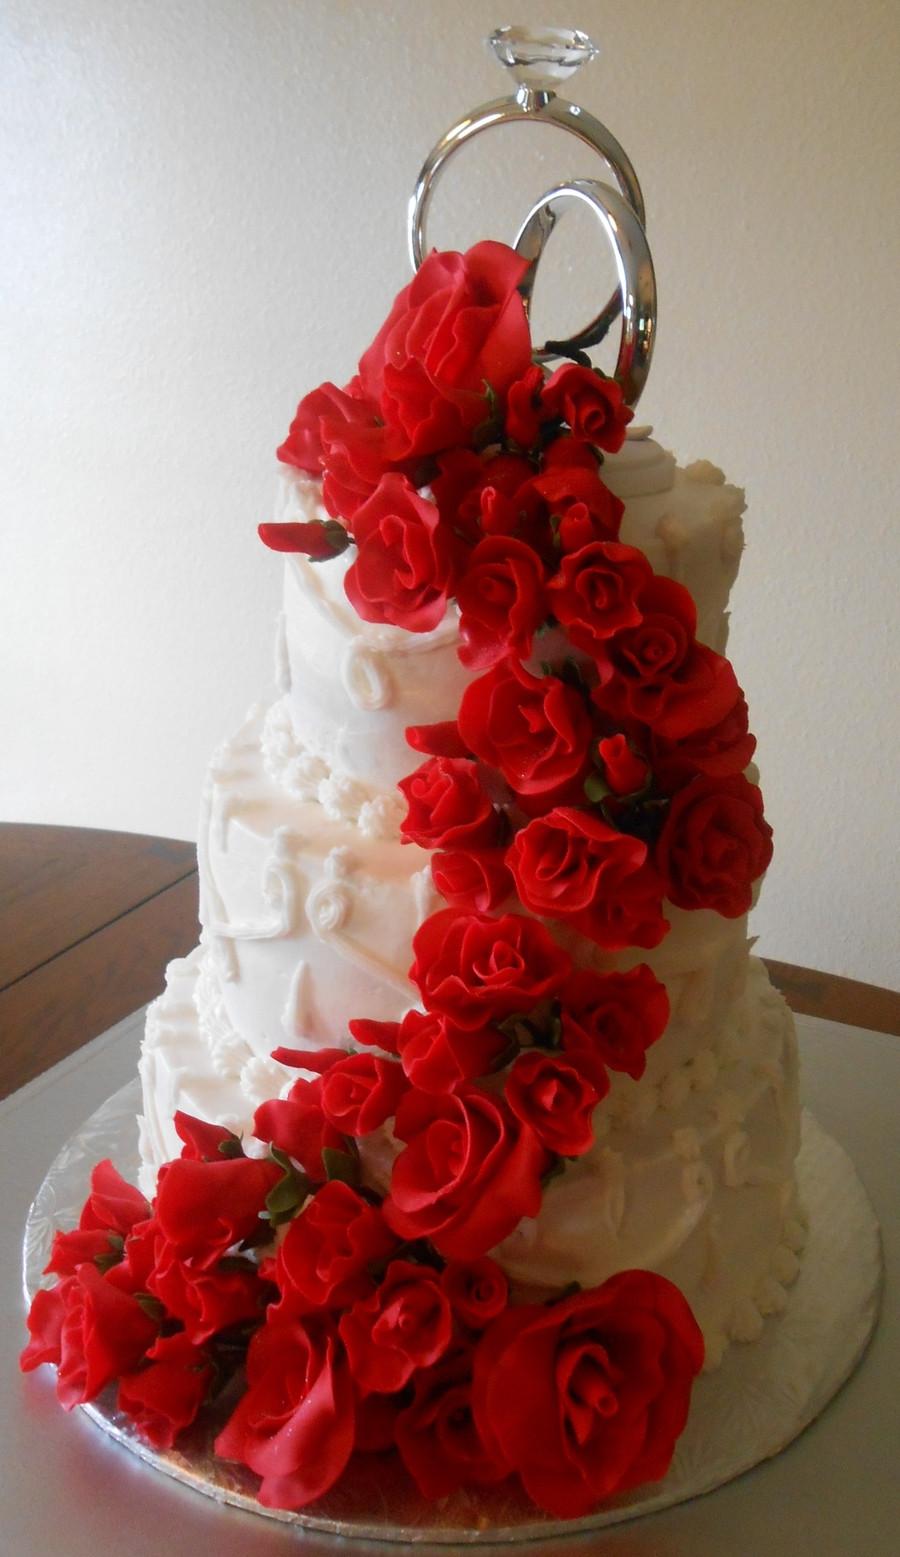 Wedding Cakes Red Roses  Red Roses Wedding Cake All Fondantgumpaste Roses Cake Was